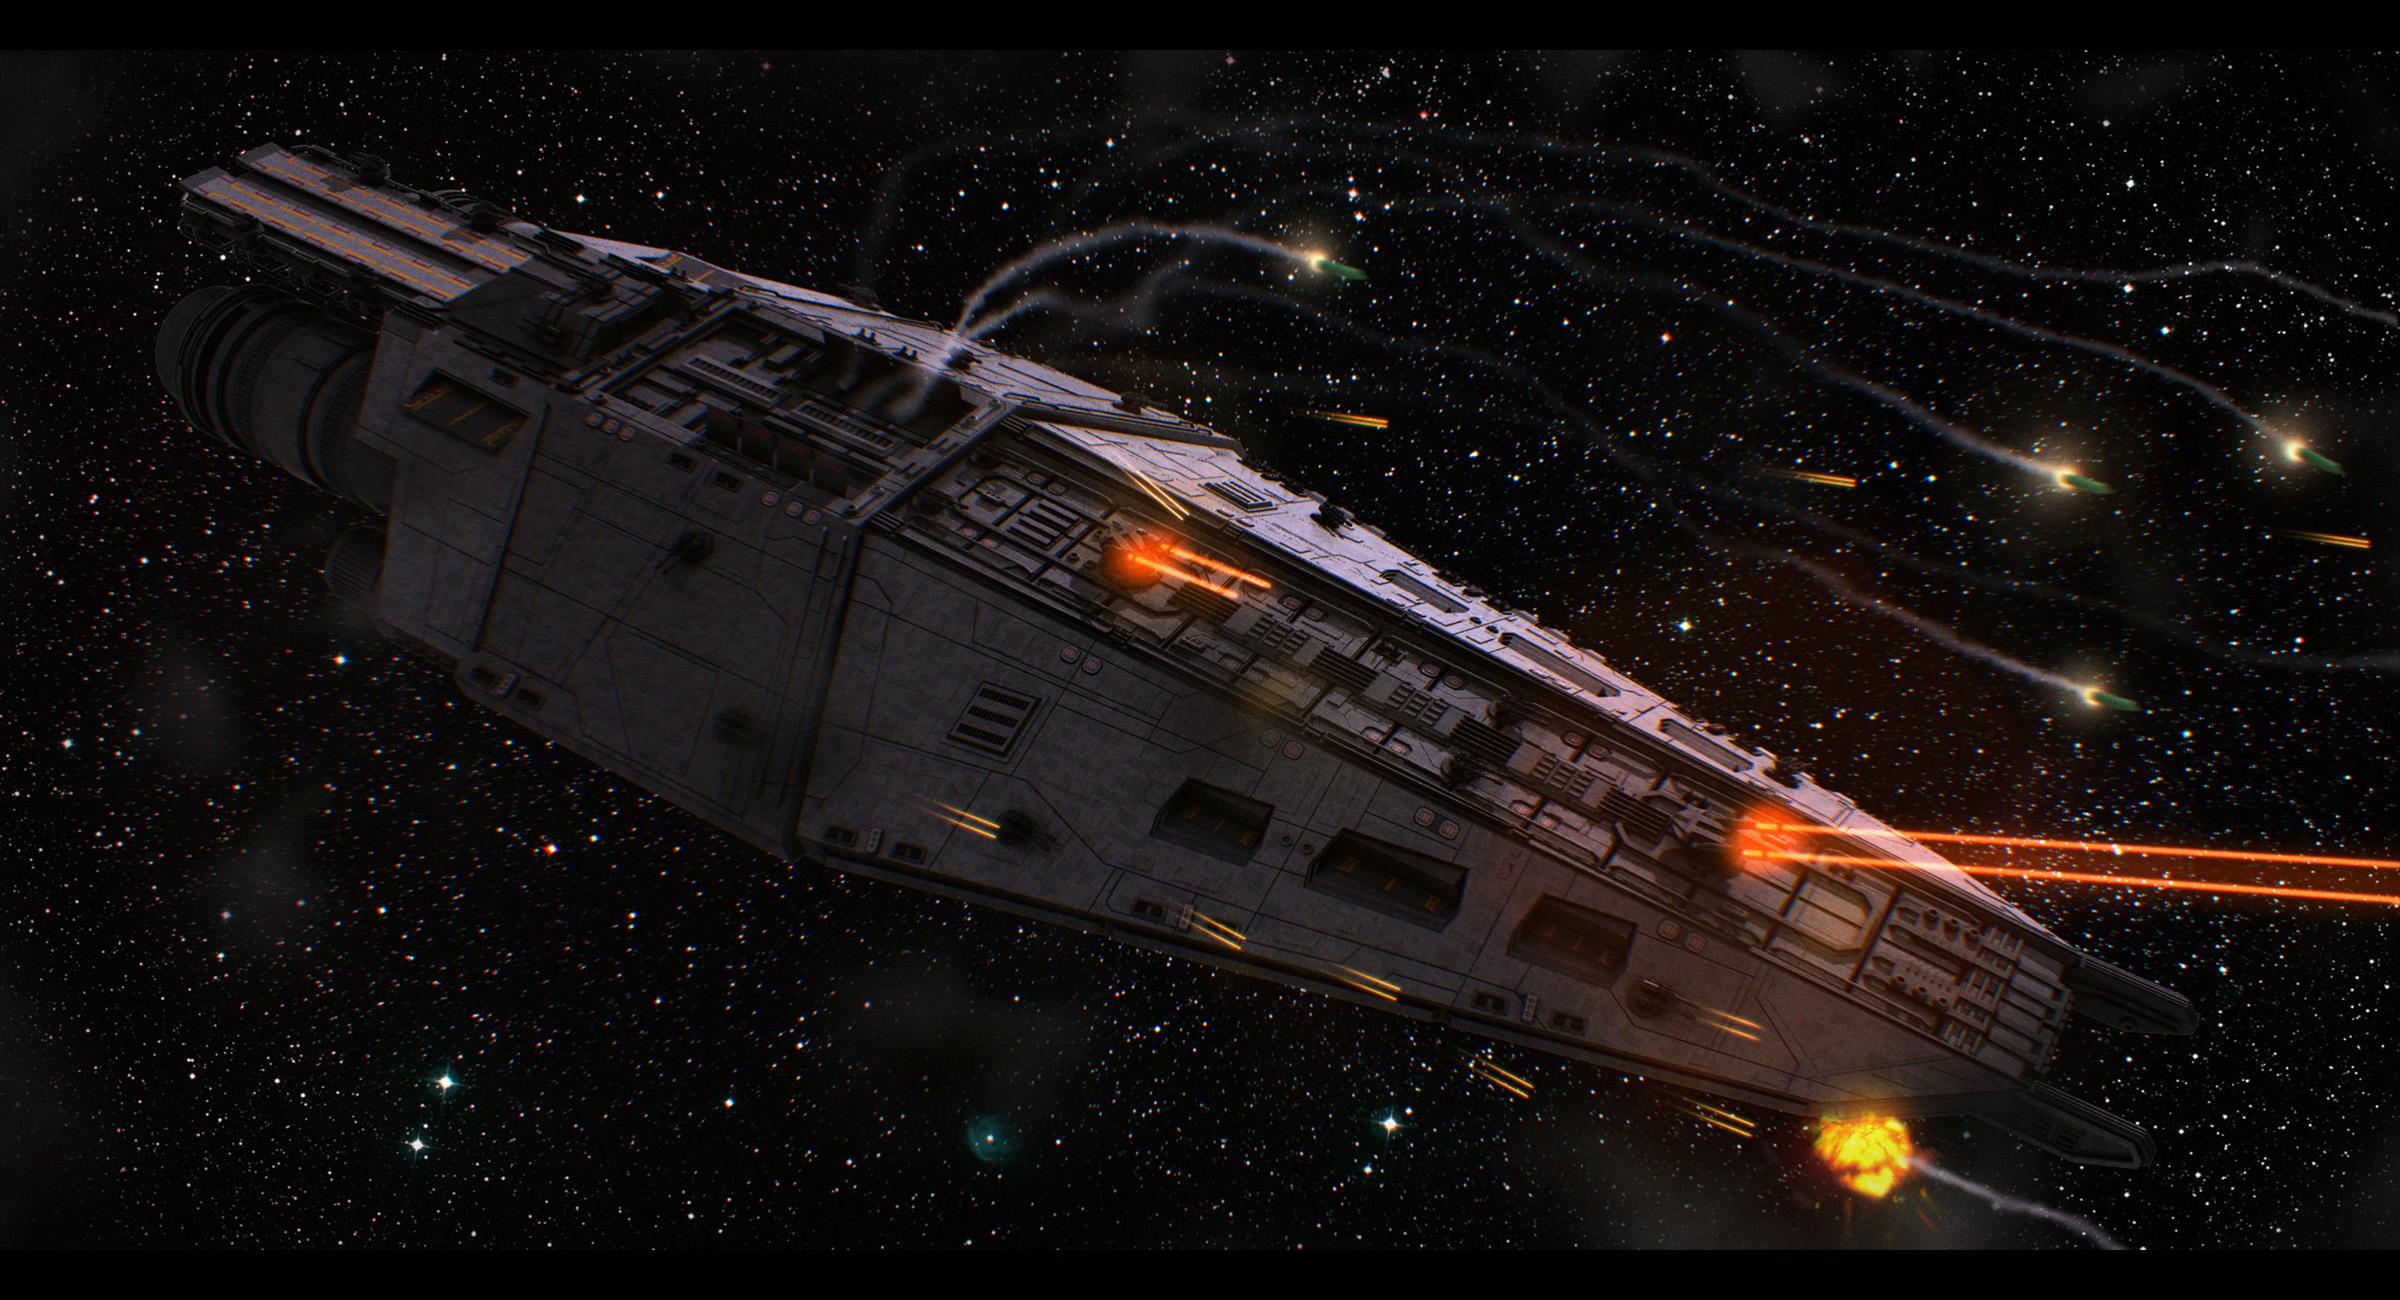 Terran Alliance Warship: Raptor's Wrath 2 by Dreamer-Out ...